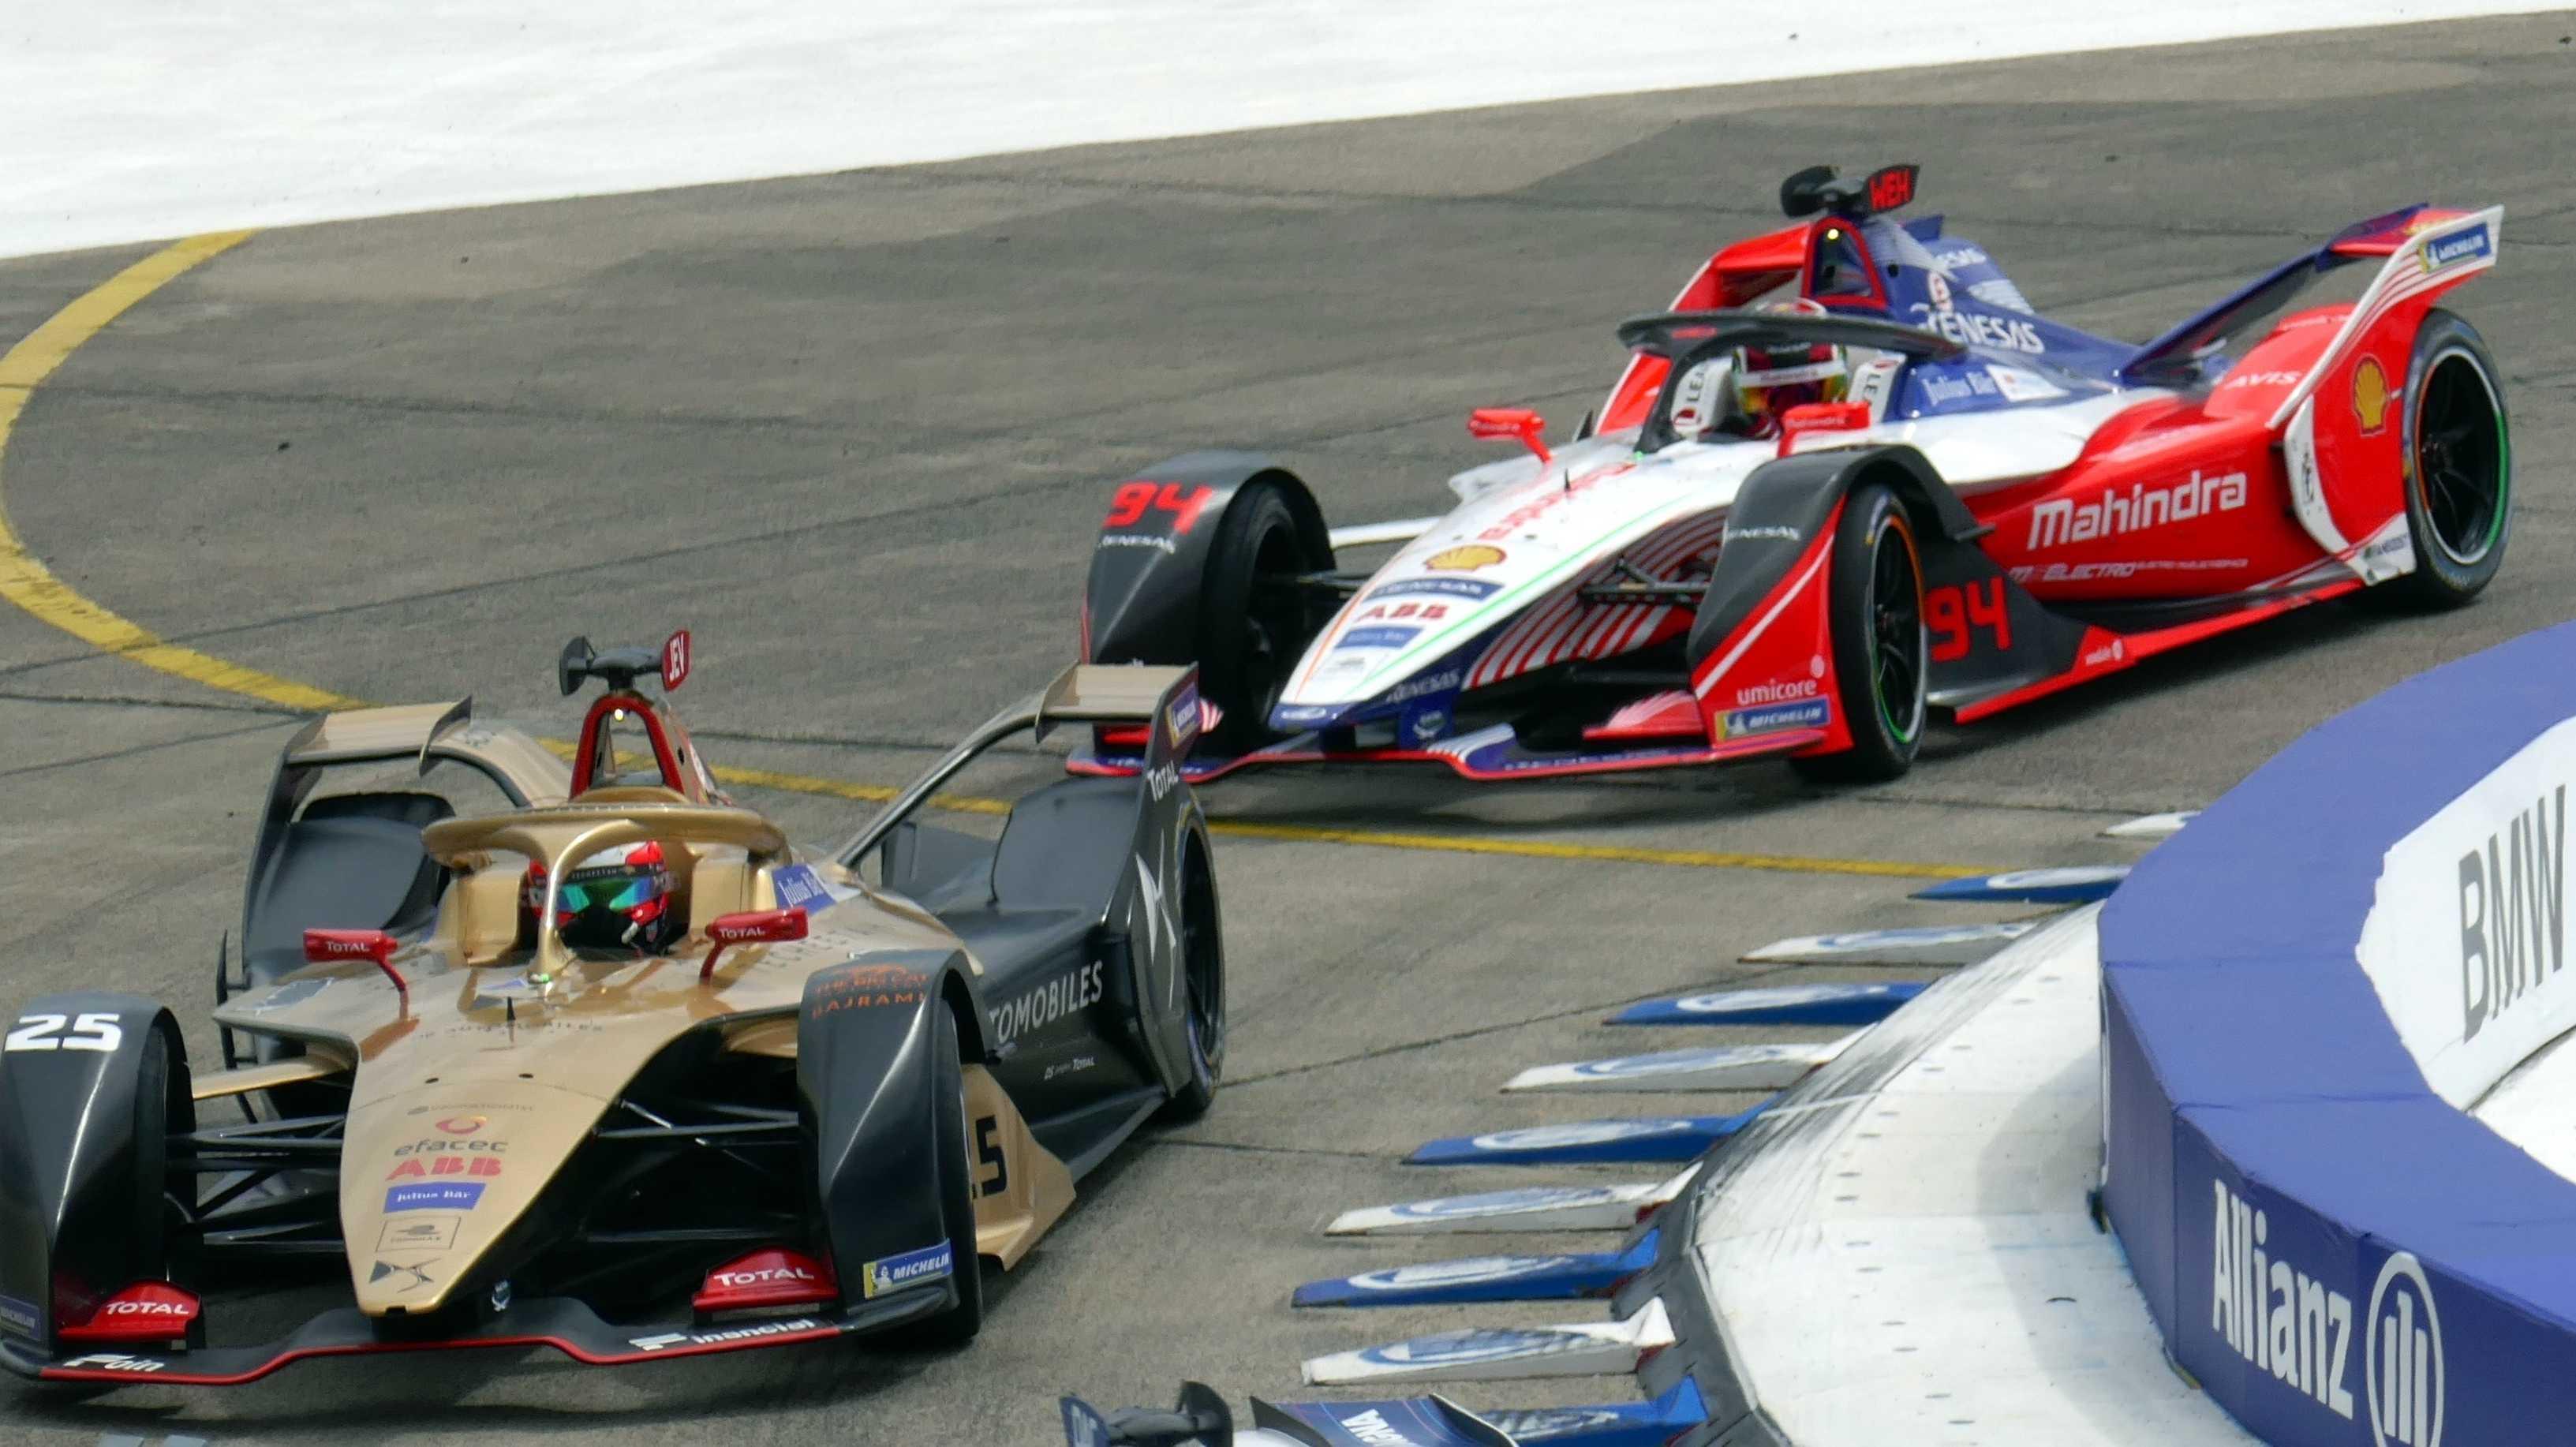 Formel E: Technik und Taktik